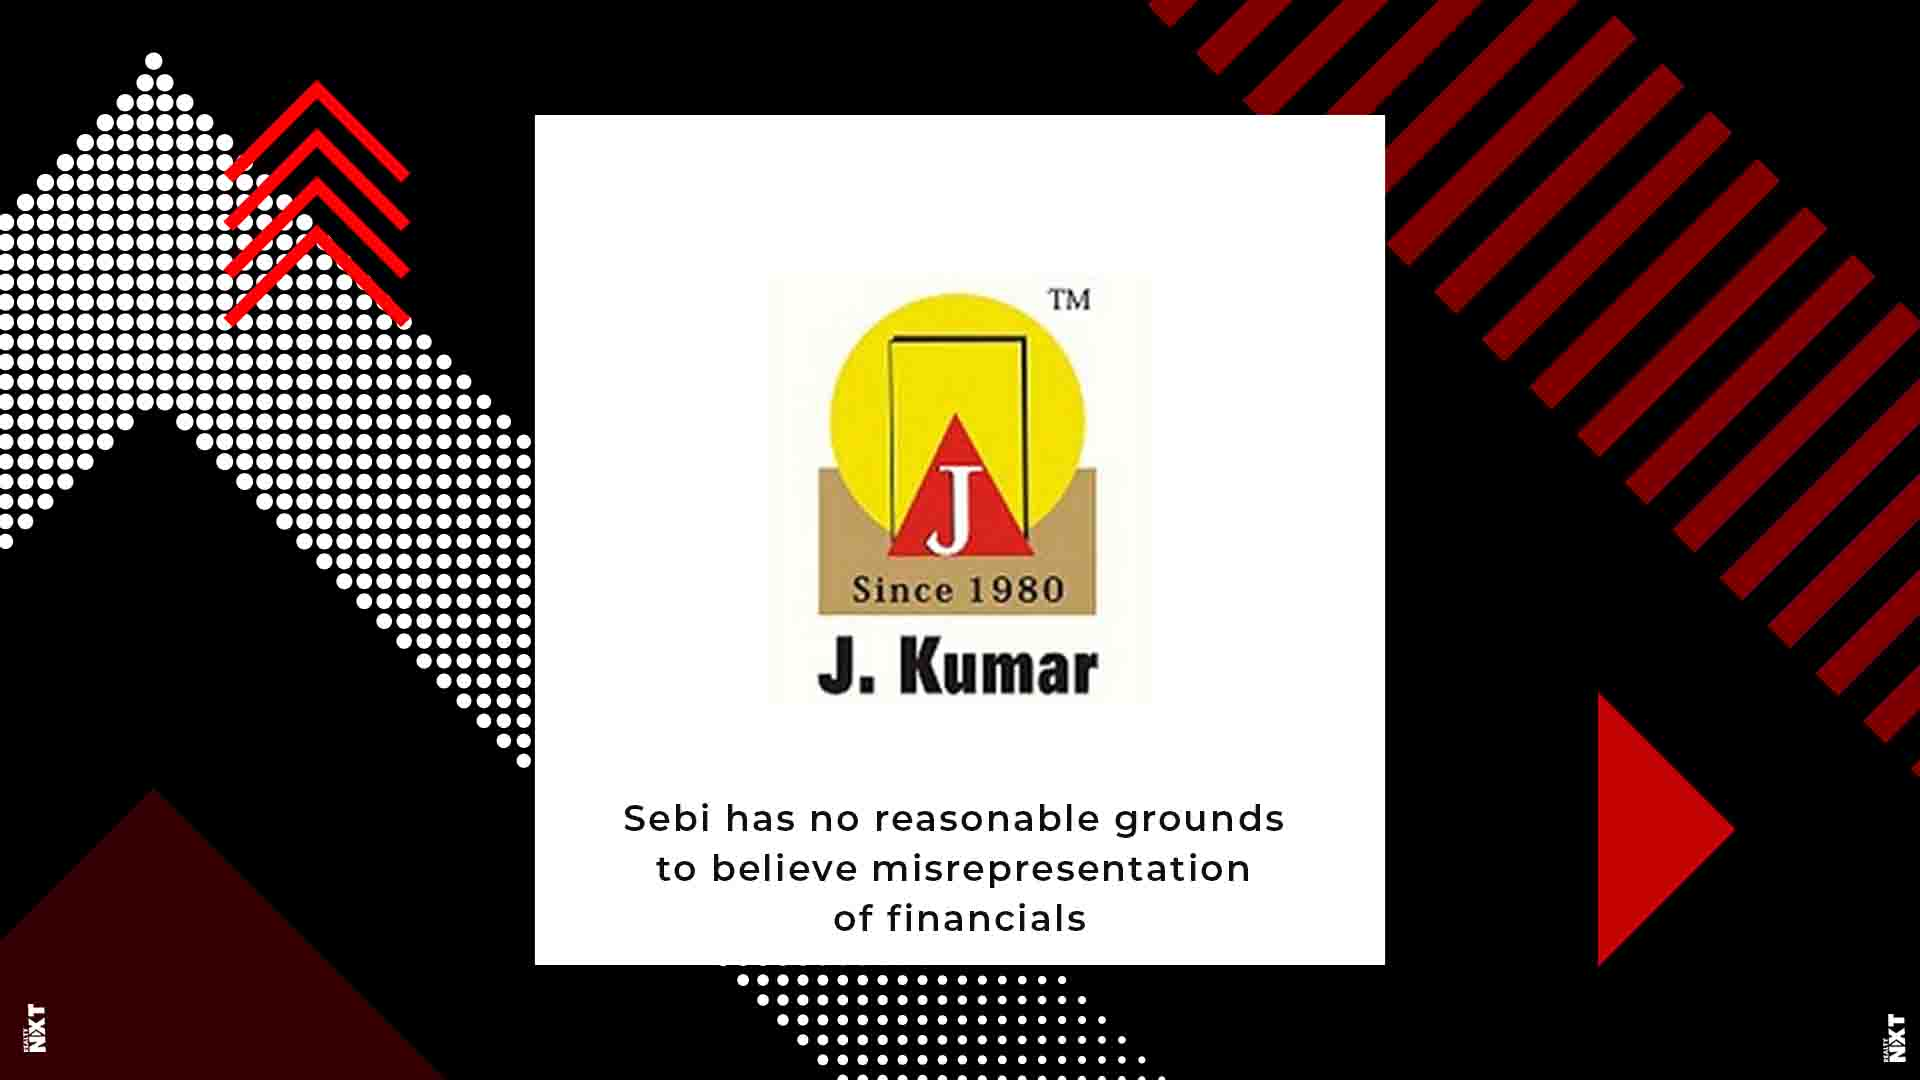 J.Kumar Infraprojects didn't misrepresent financials with regards to PACL: Sebi